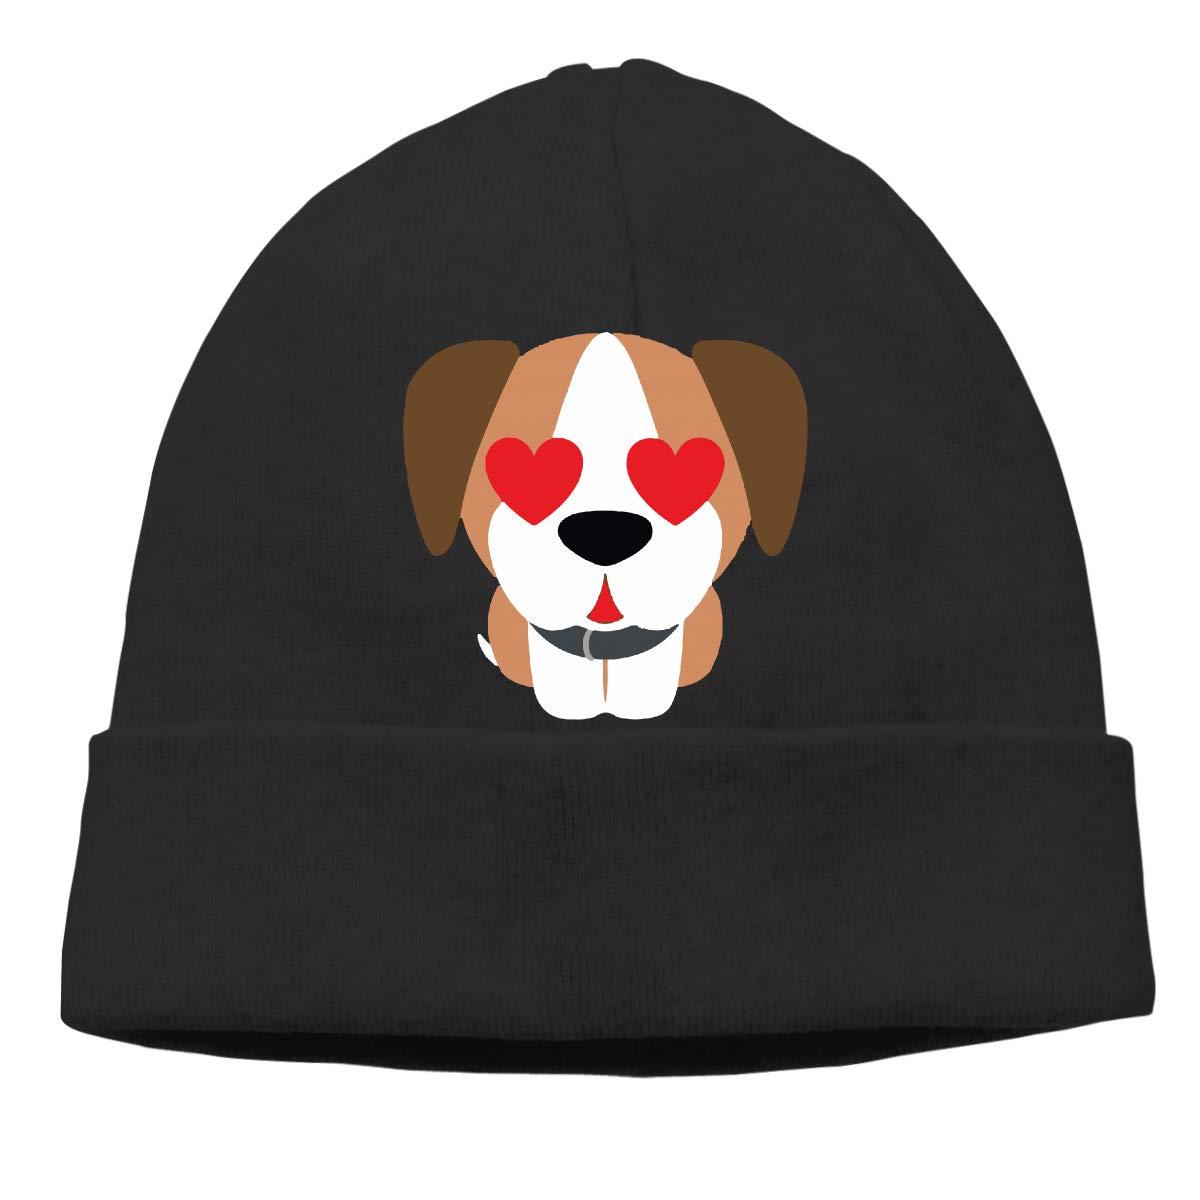 GDSG5/&4 Boxer Dog Unisex Great Thermal Sports Beanie Hat